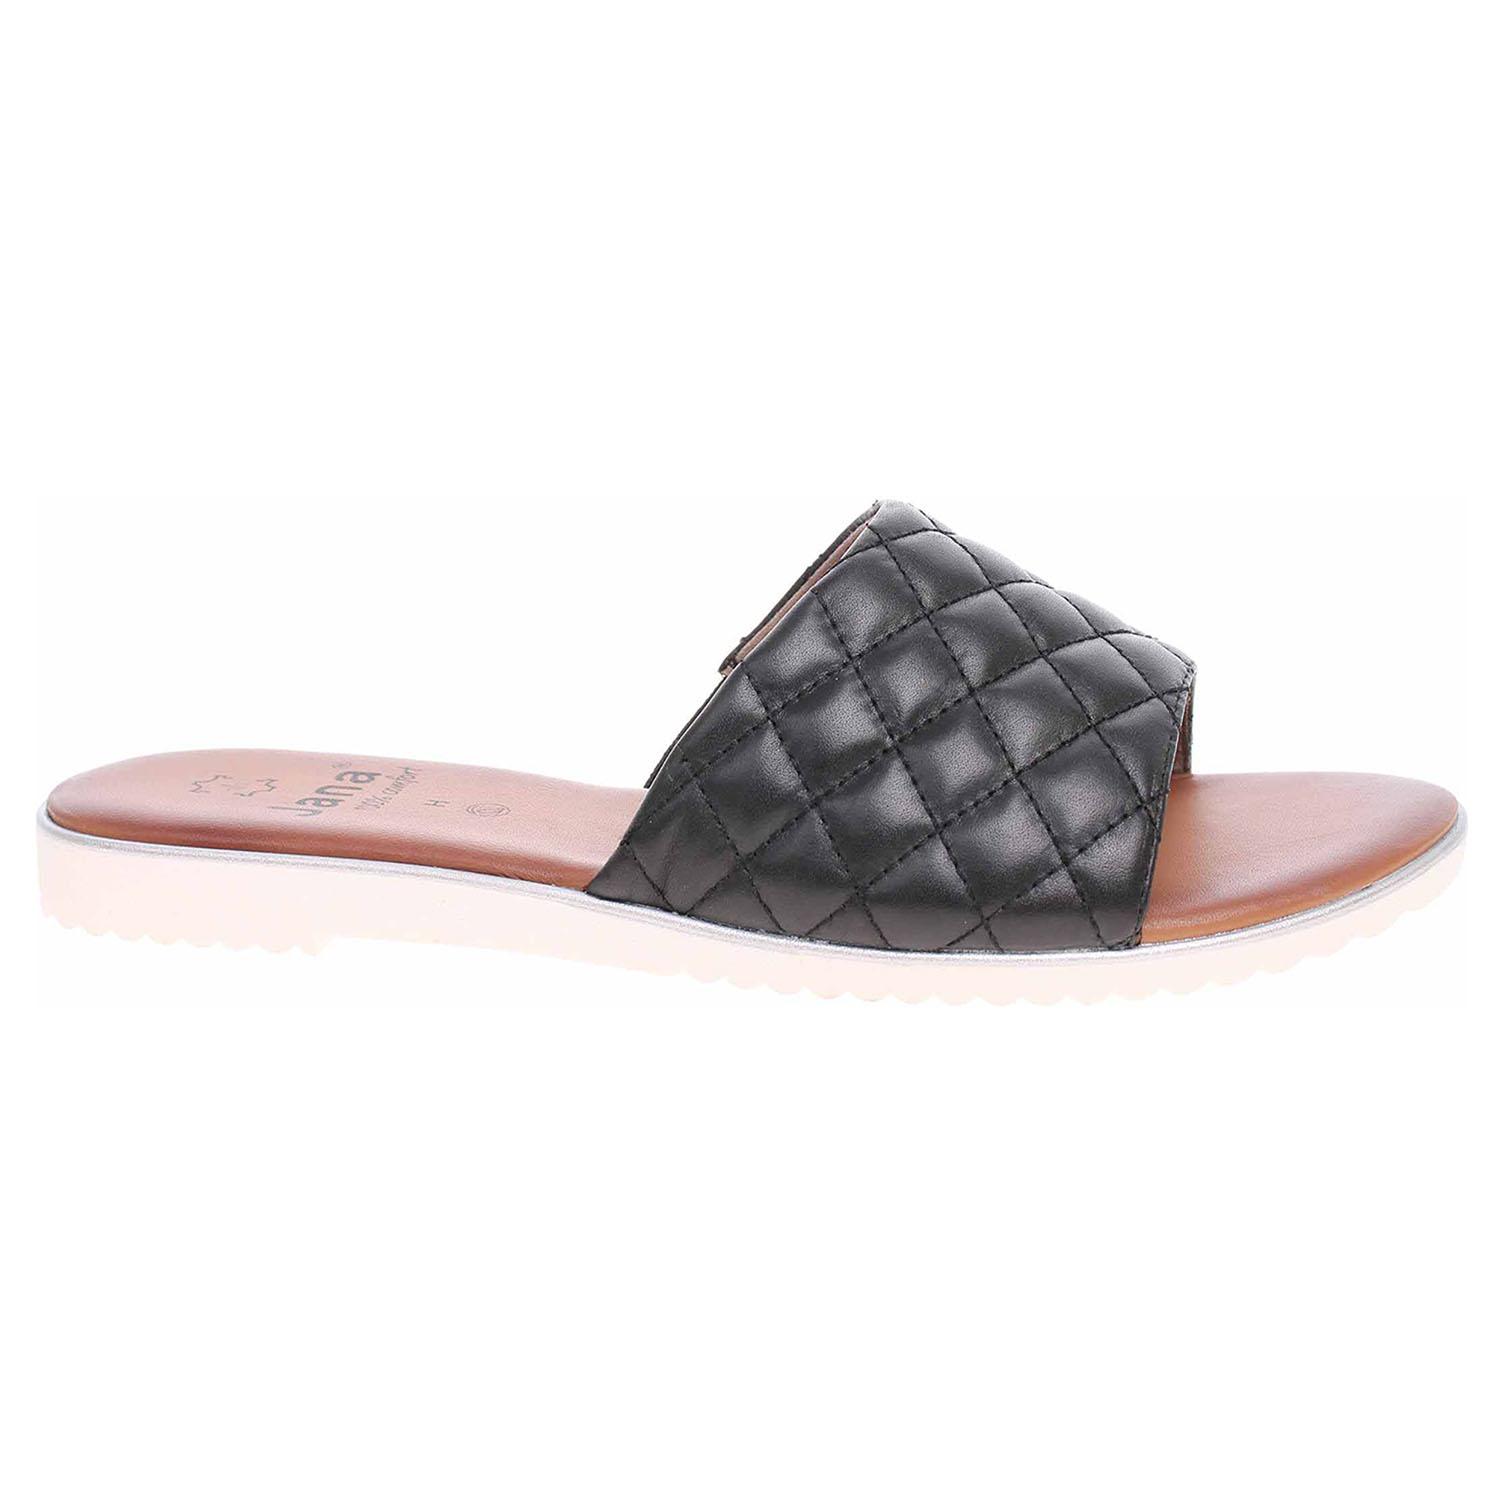 Dámské pantofle Jana 8-27106-26 black 8-8-27106-26 001 45